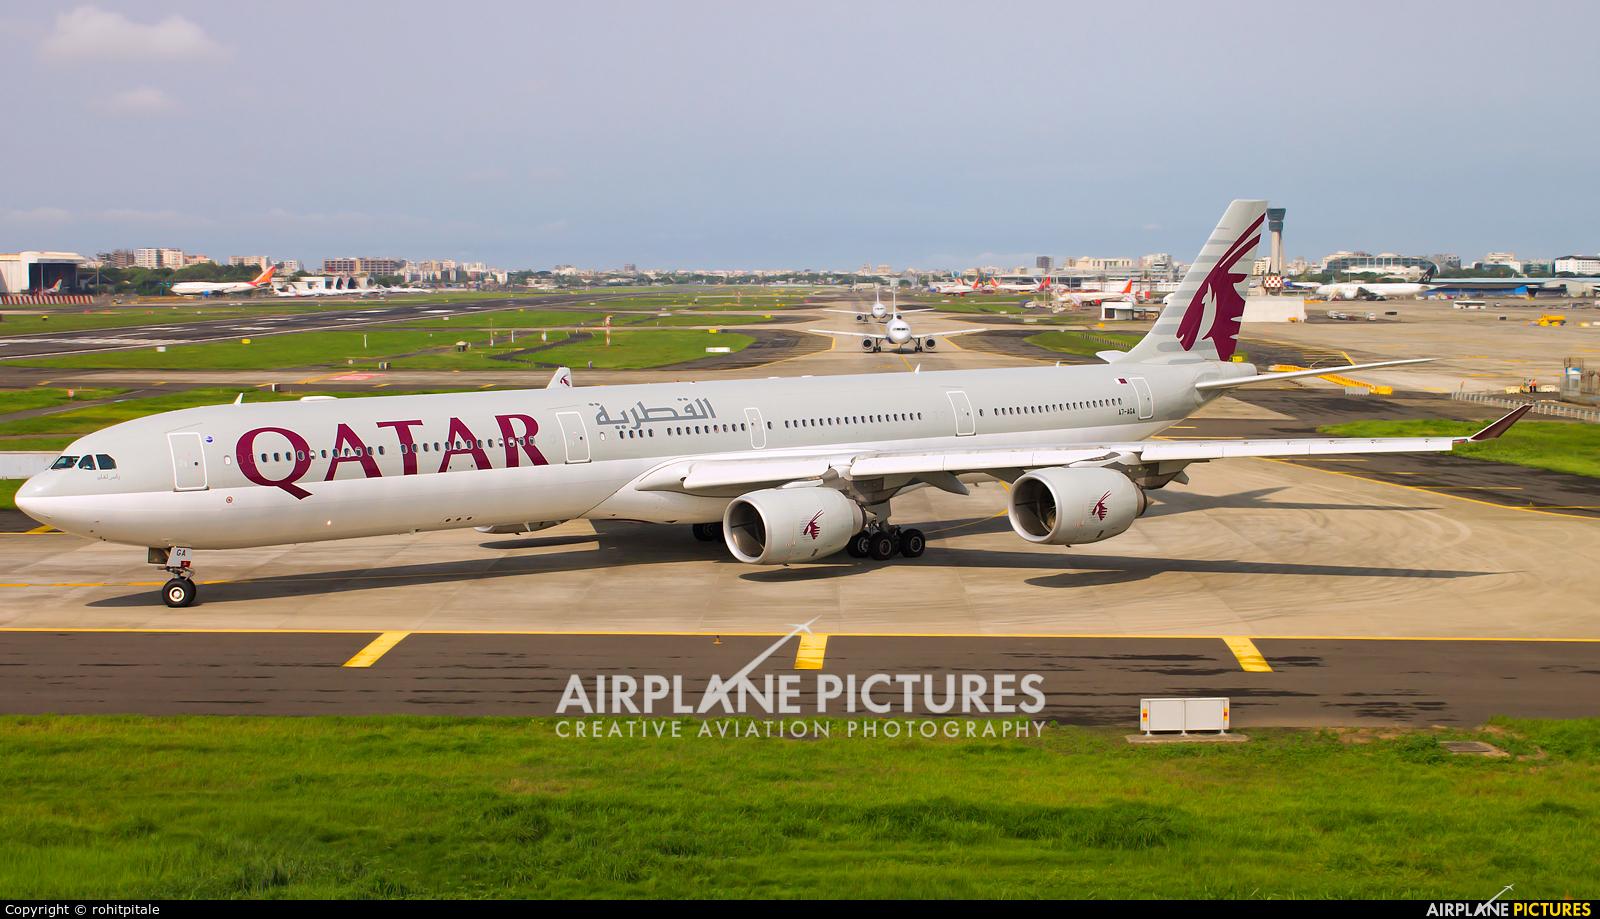 Qatar Airways A7-AGA aircraft at Mumbai - Chhatrapati Shivaji Intl